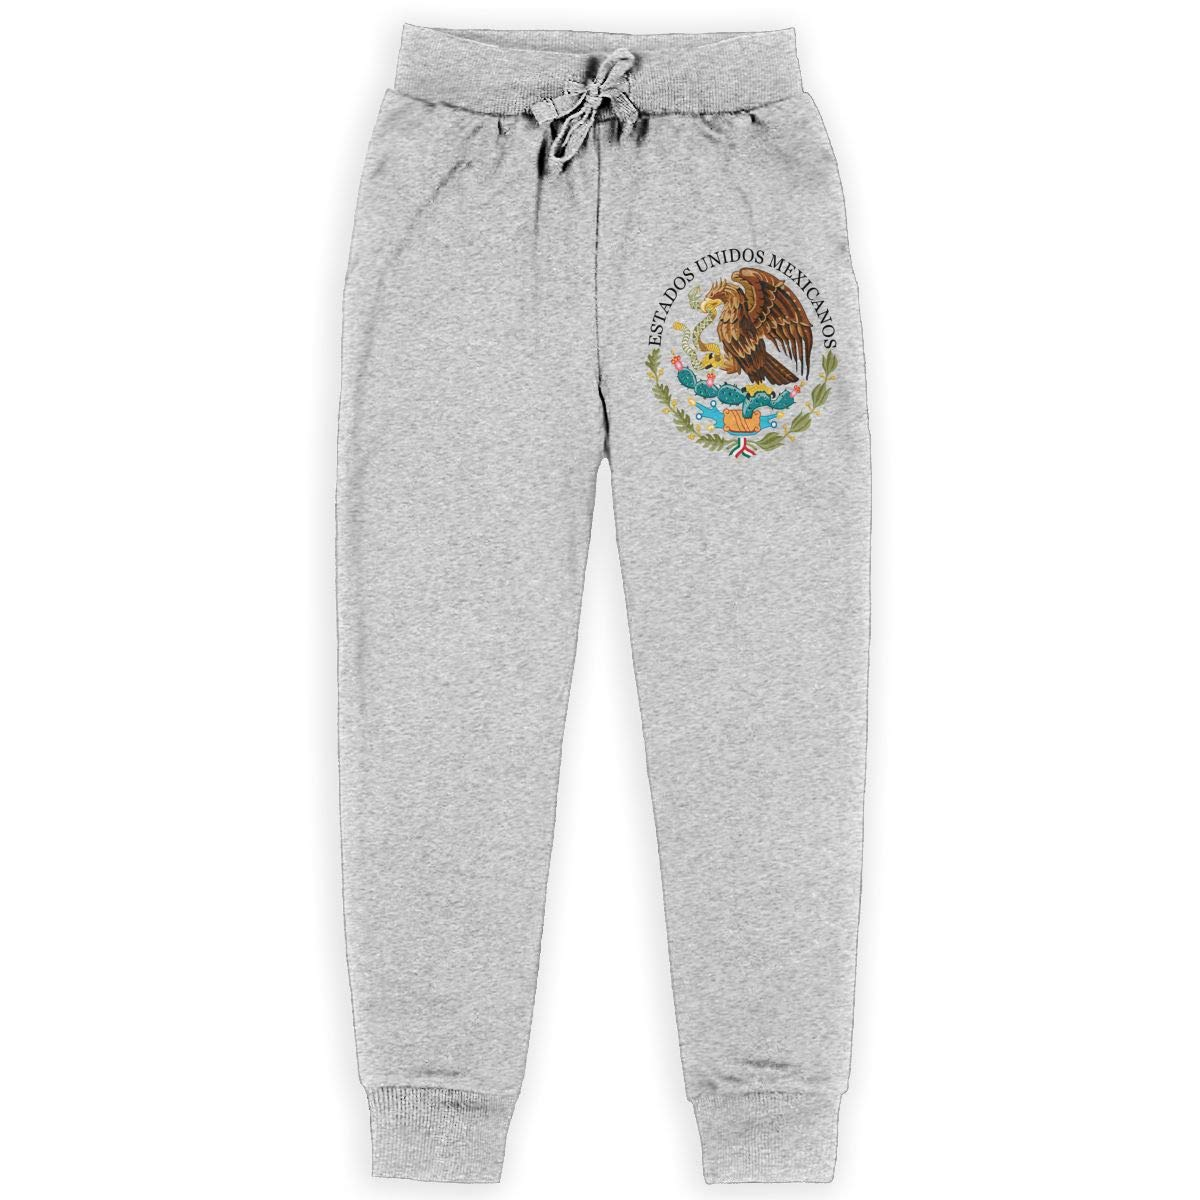 Fleece Active Joggers Elastic Pants Eagle Sweatpants for Boys /& Girls